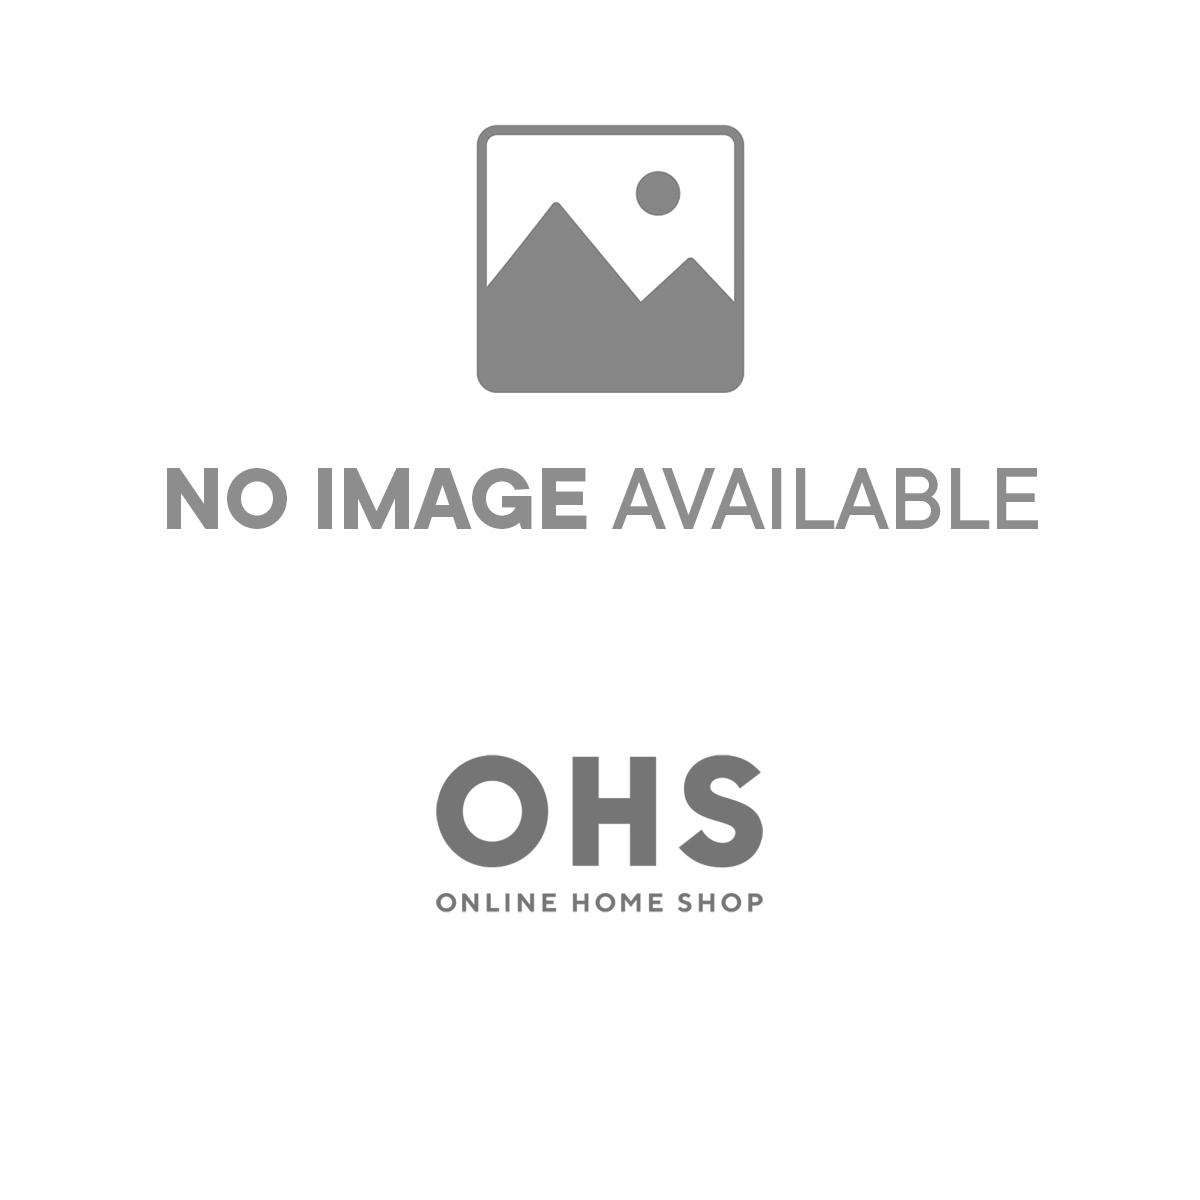 Dreamscene Duvet Cover with Pillow Case Bedding Set Kitty - Single